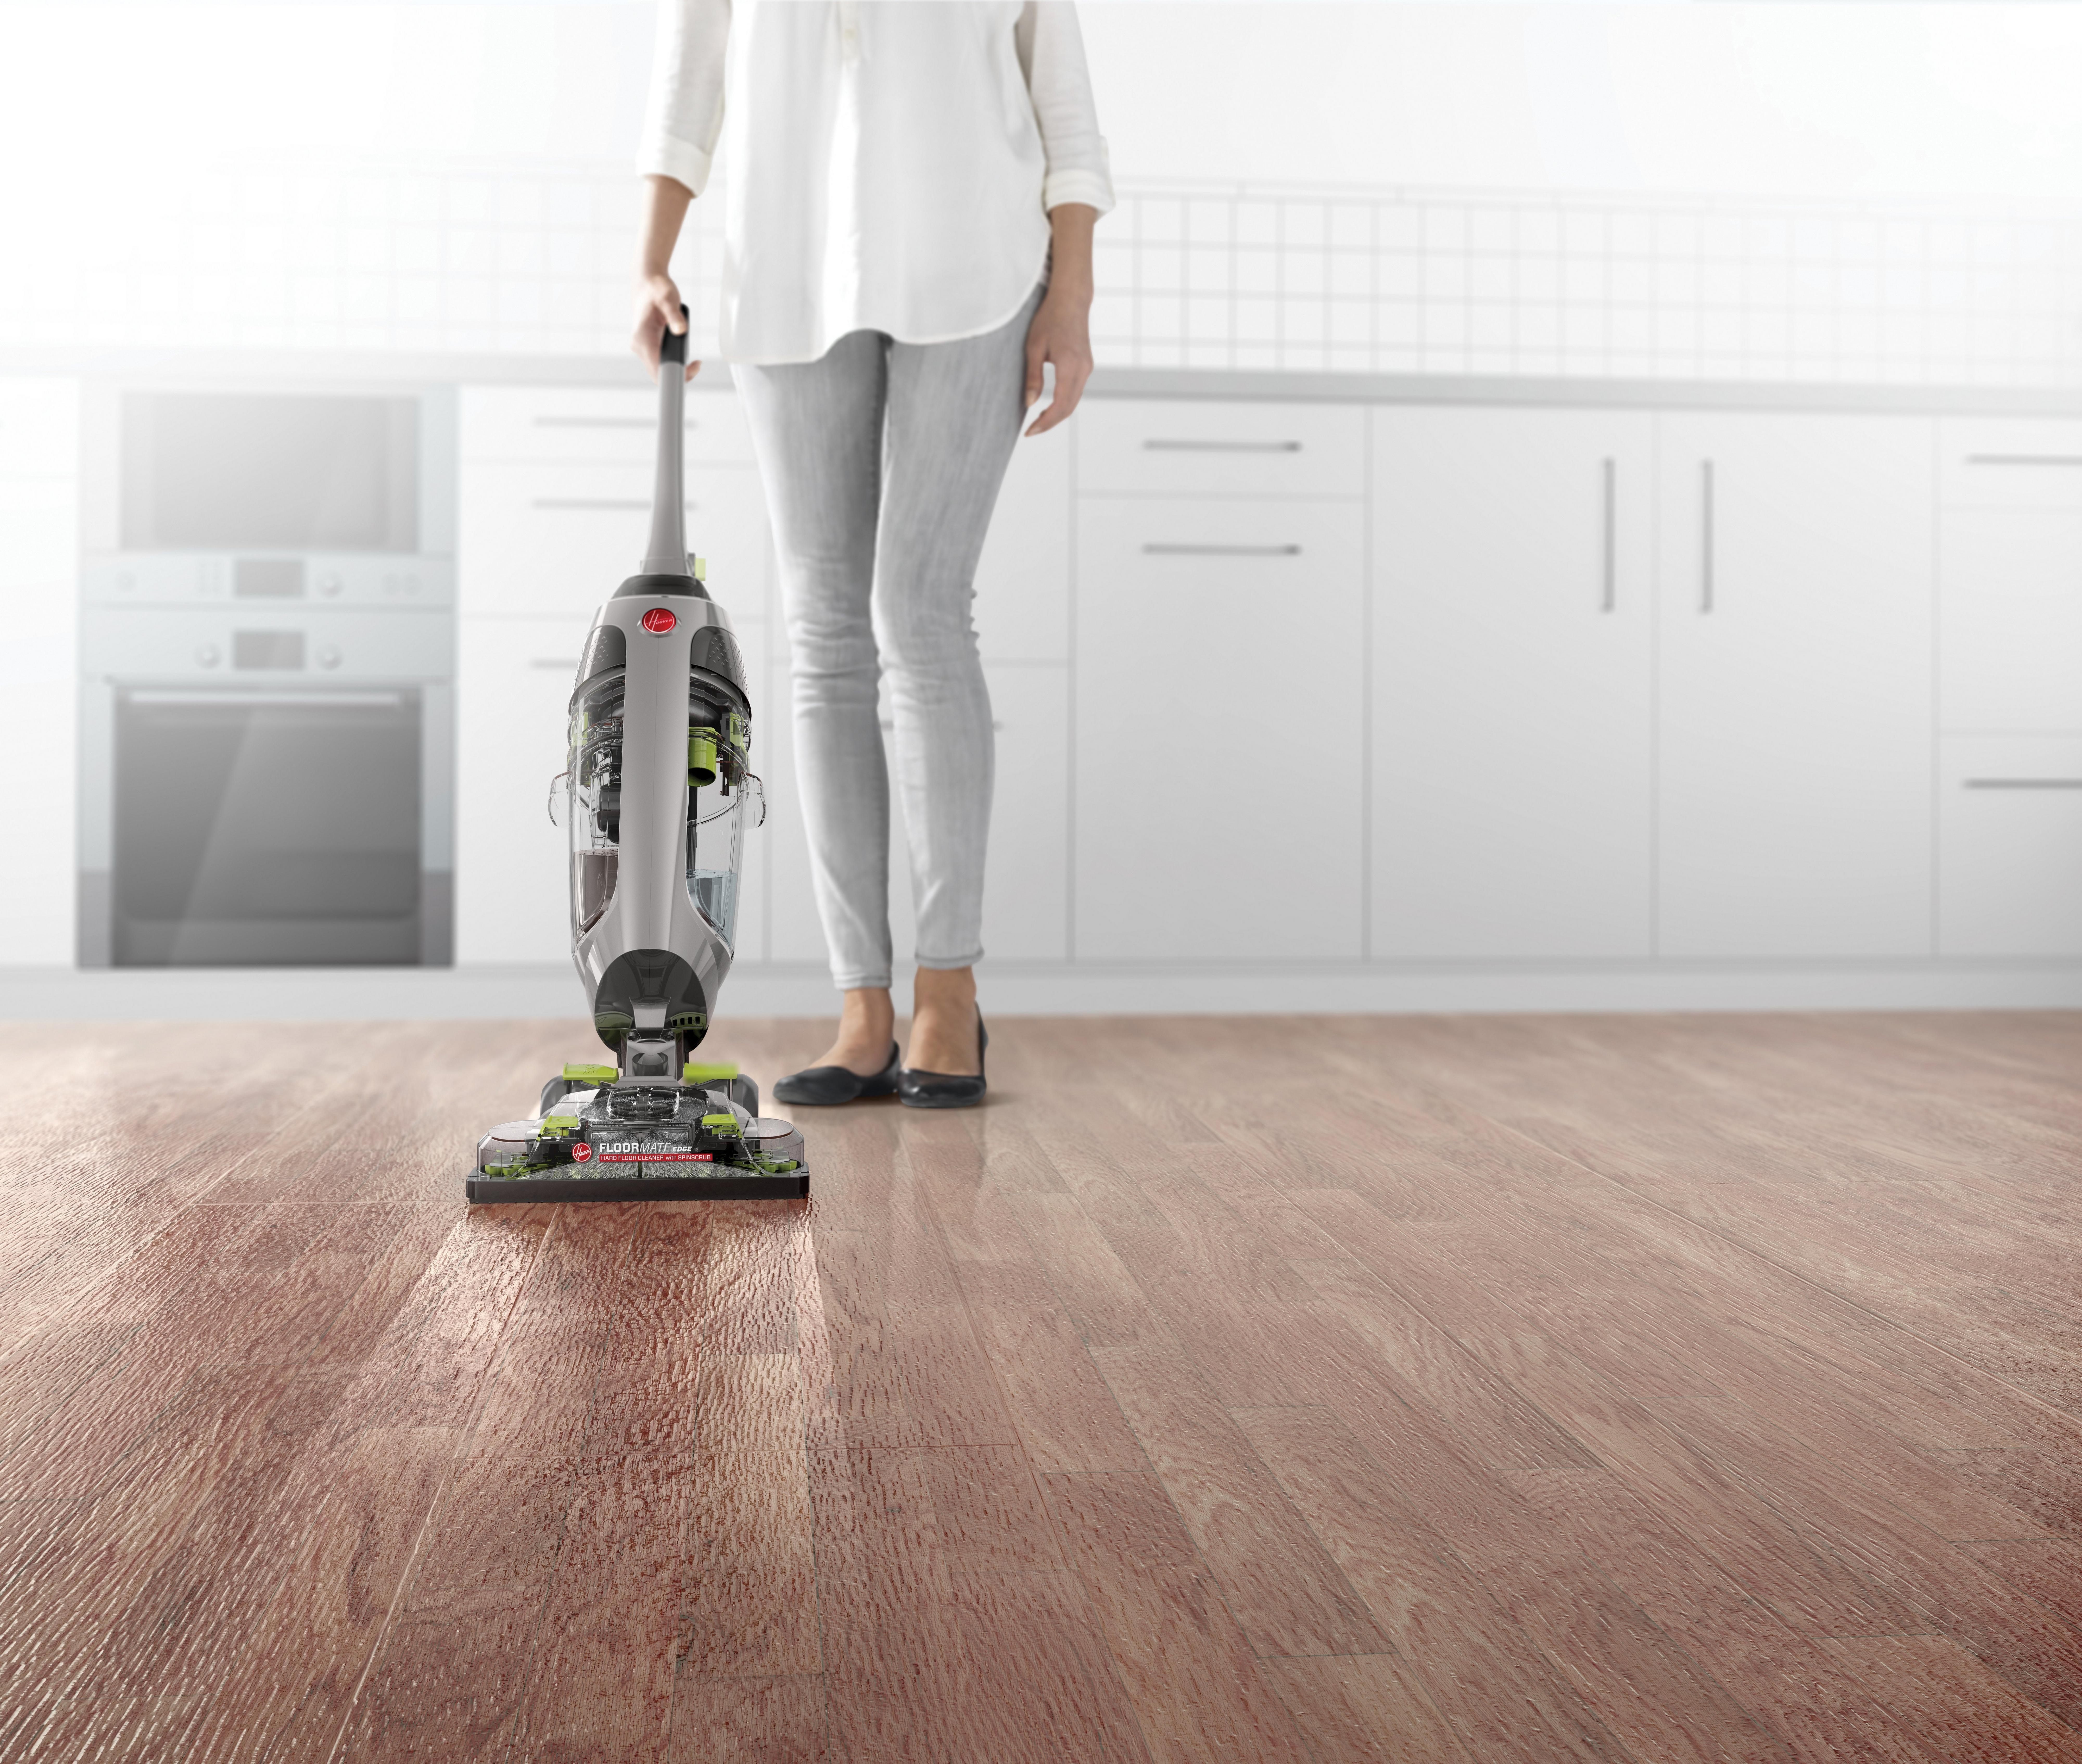 Hoover floormate edge hard floor cleaner fh40190 73502041987 ebay hoover floormate edge hard floor cleaner fh40190 dailygadgetfo Images